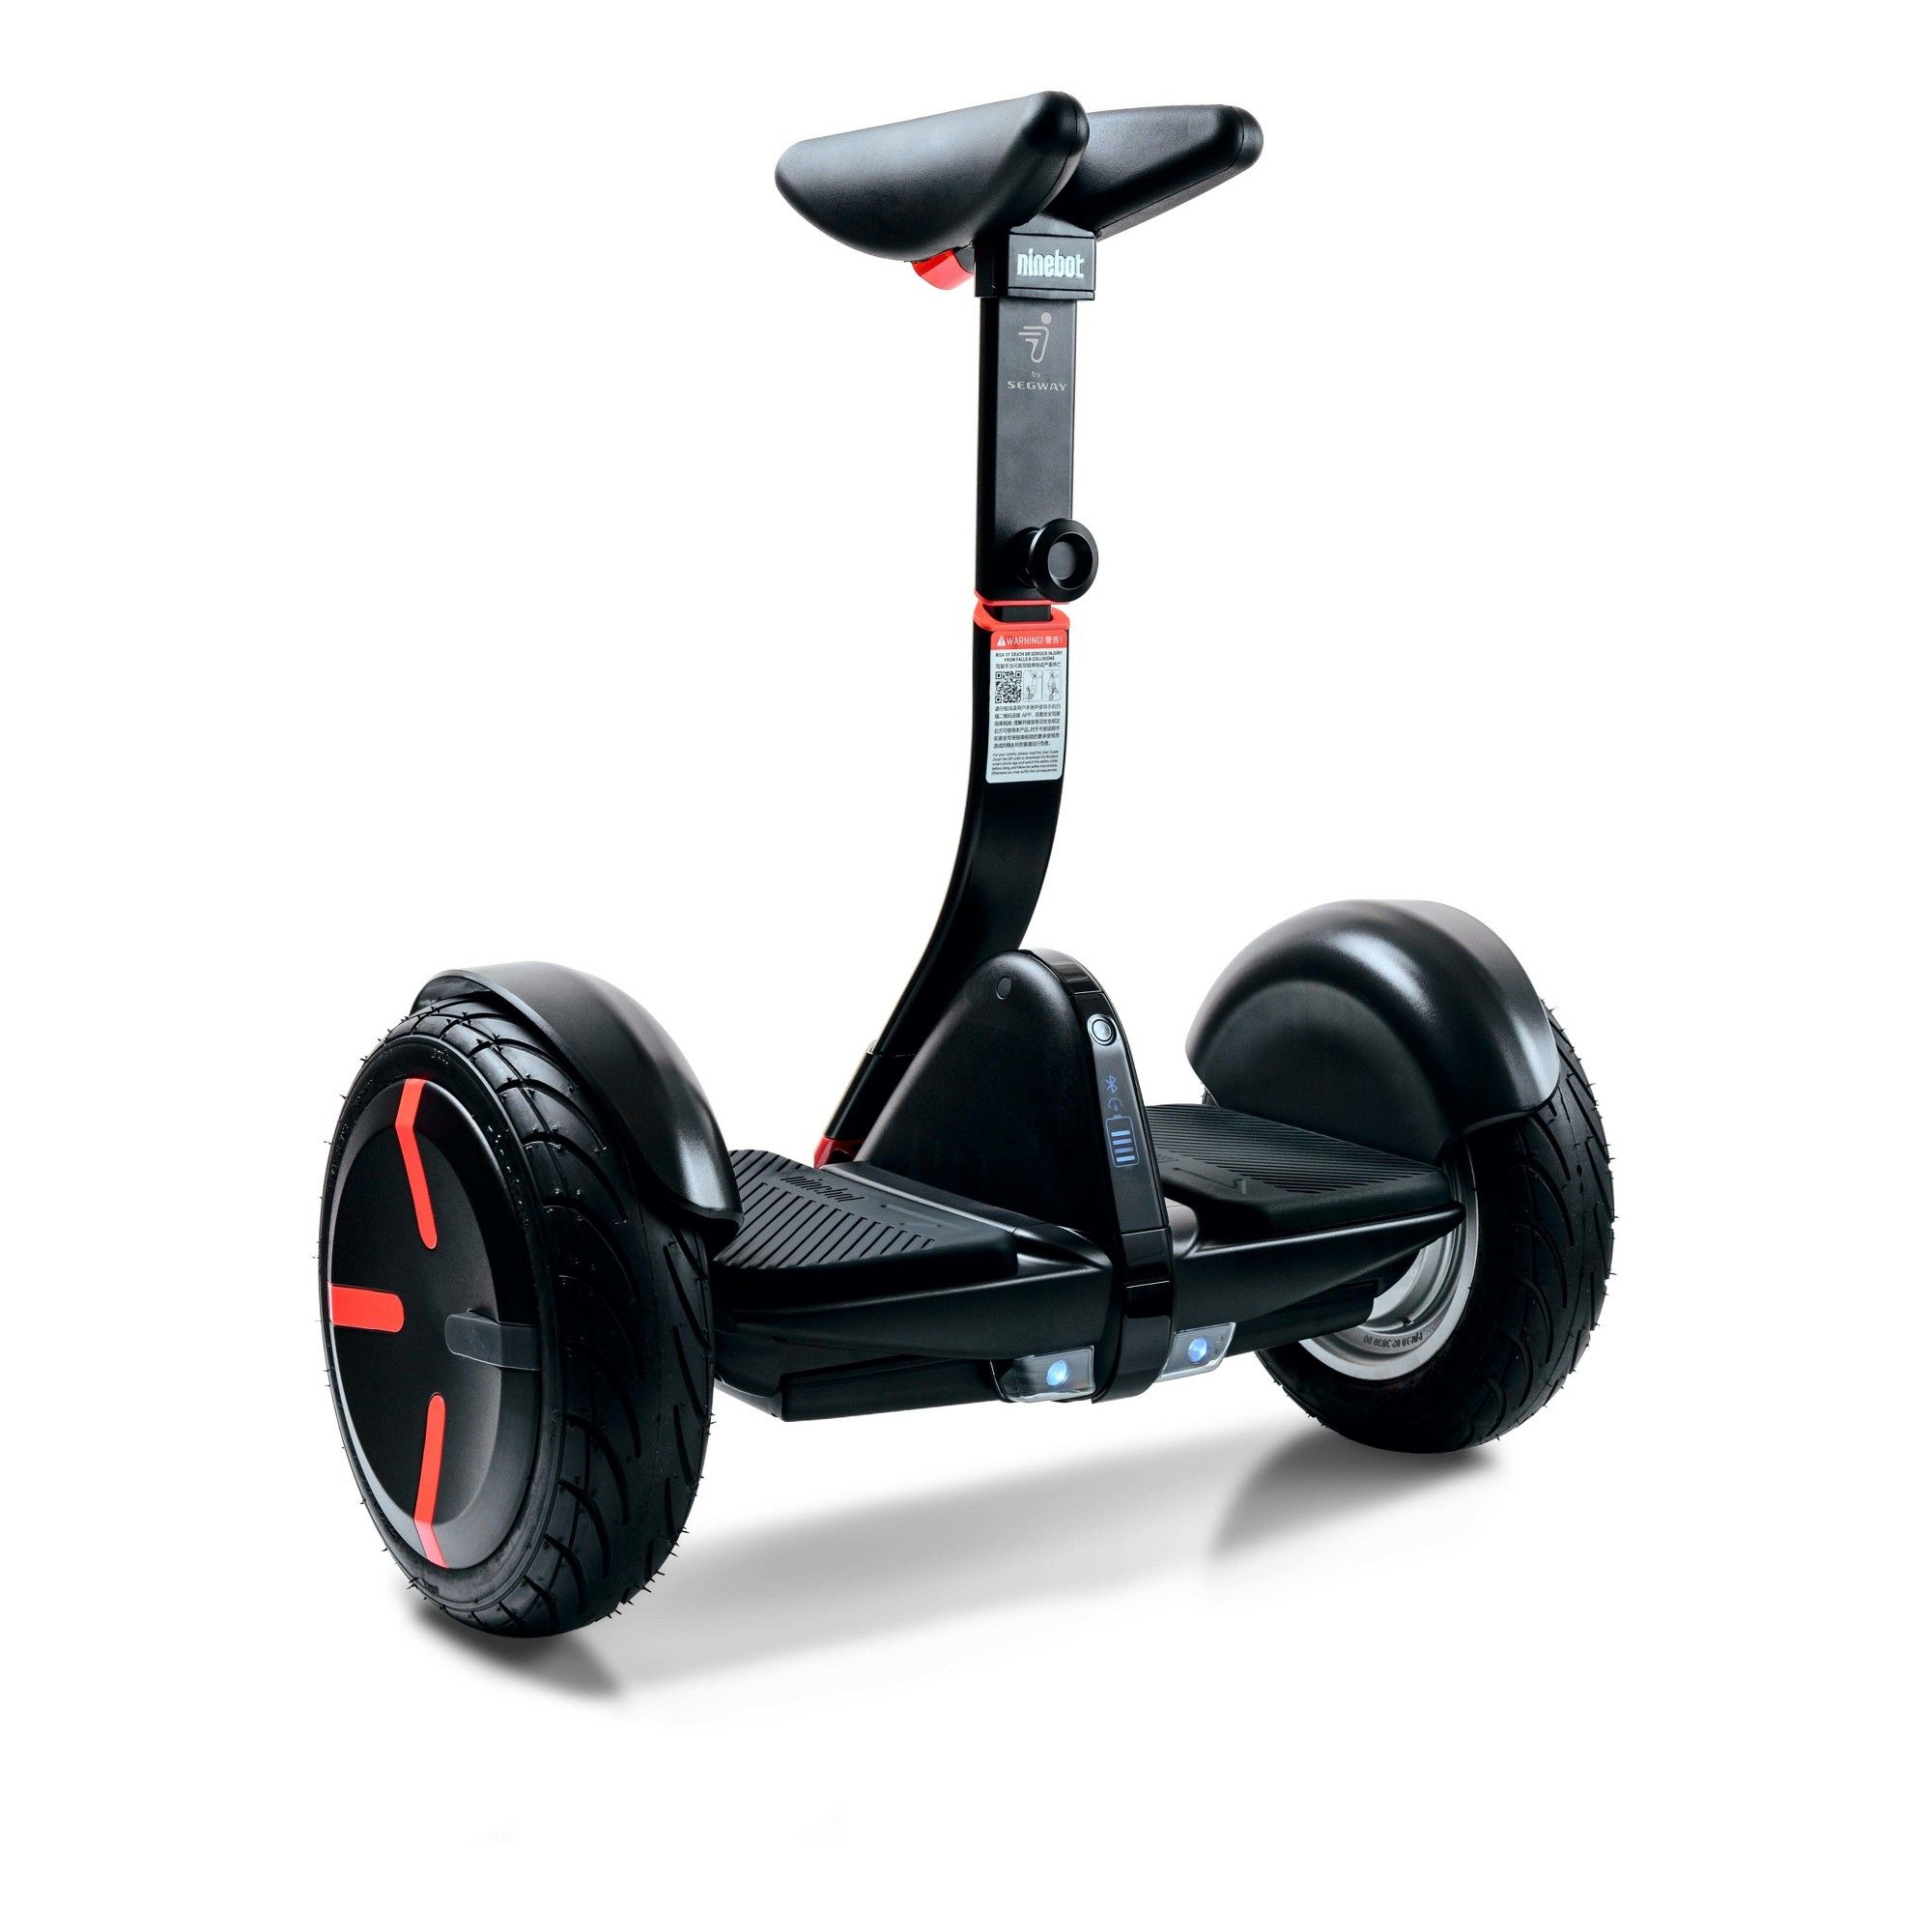 Segway Minipro Hoverboard Black Segway Personal Transporter